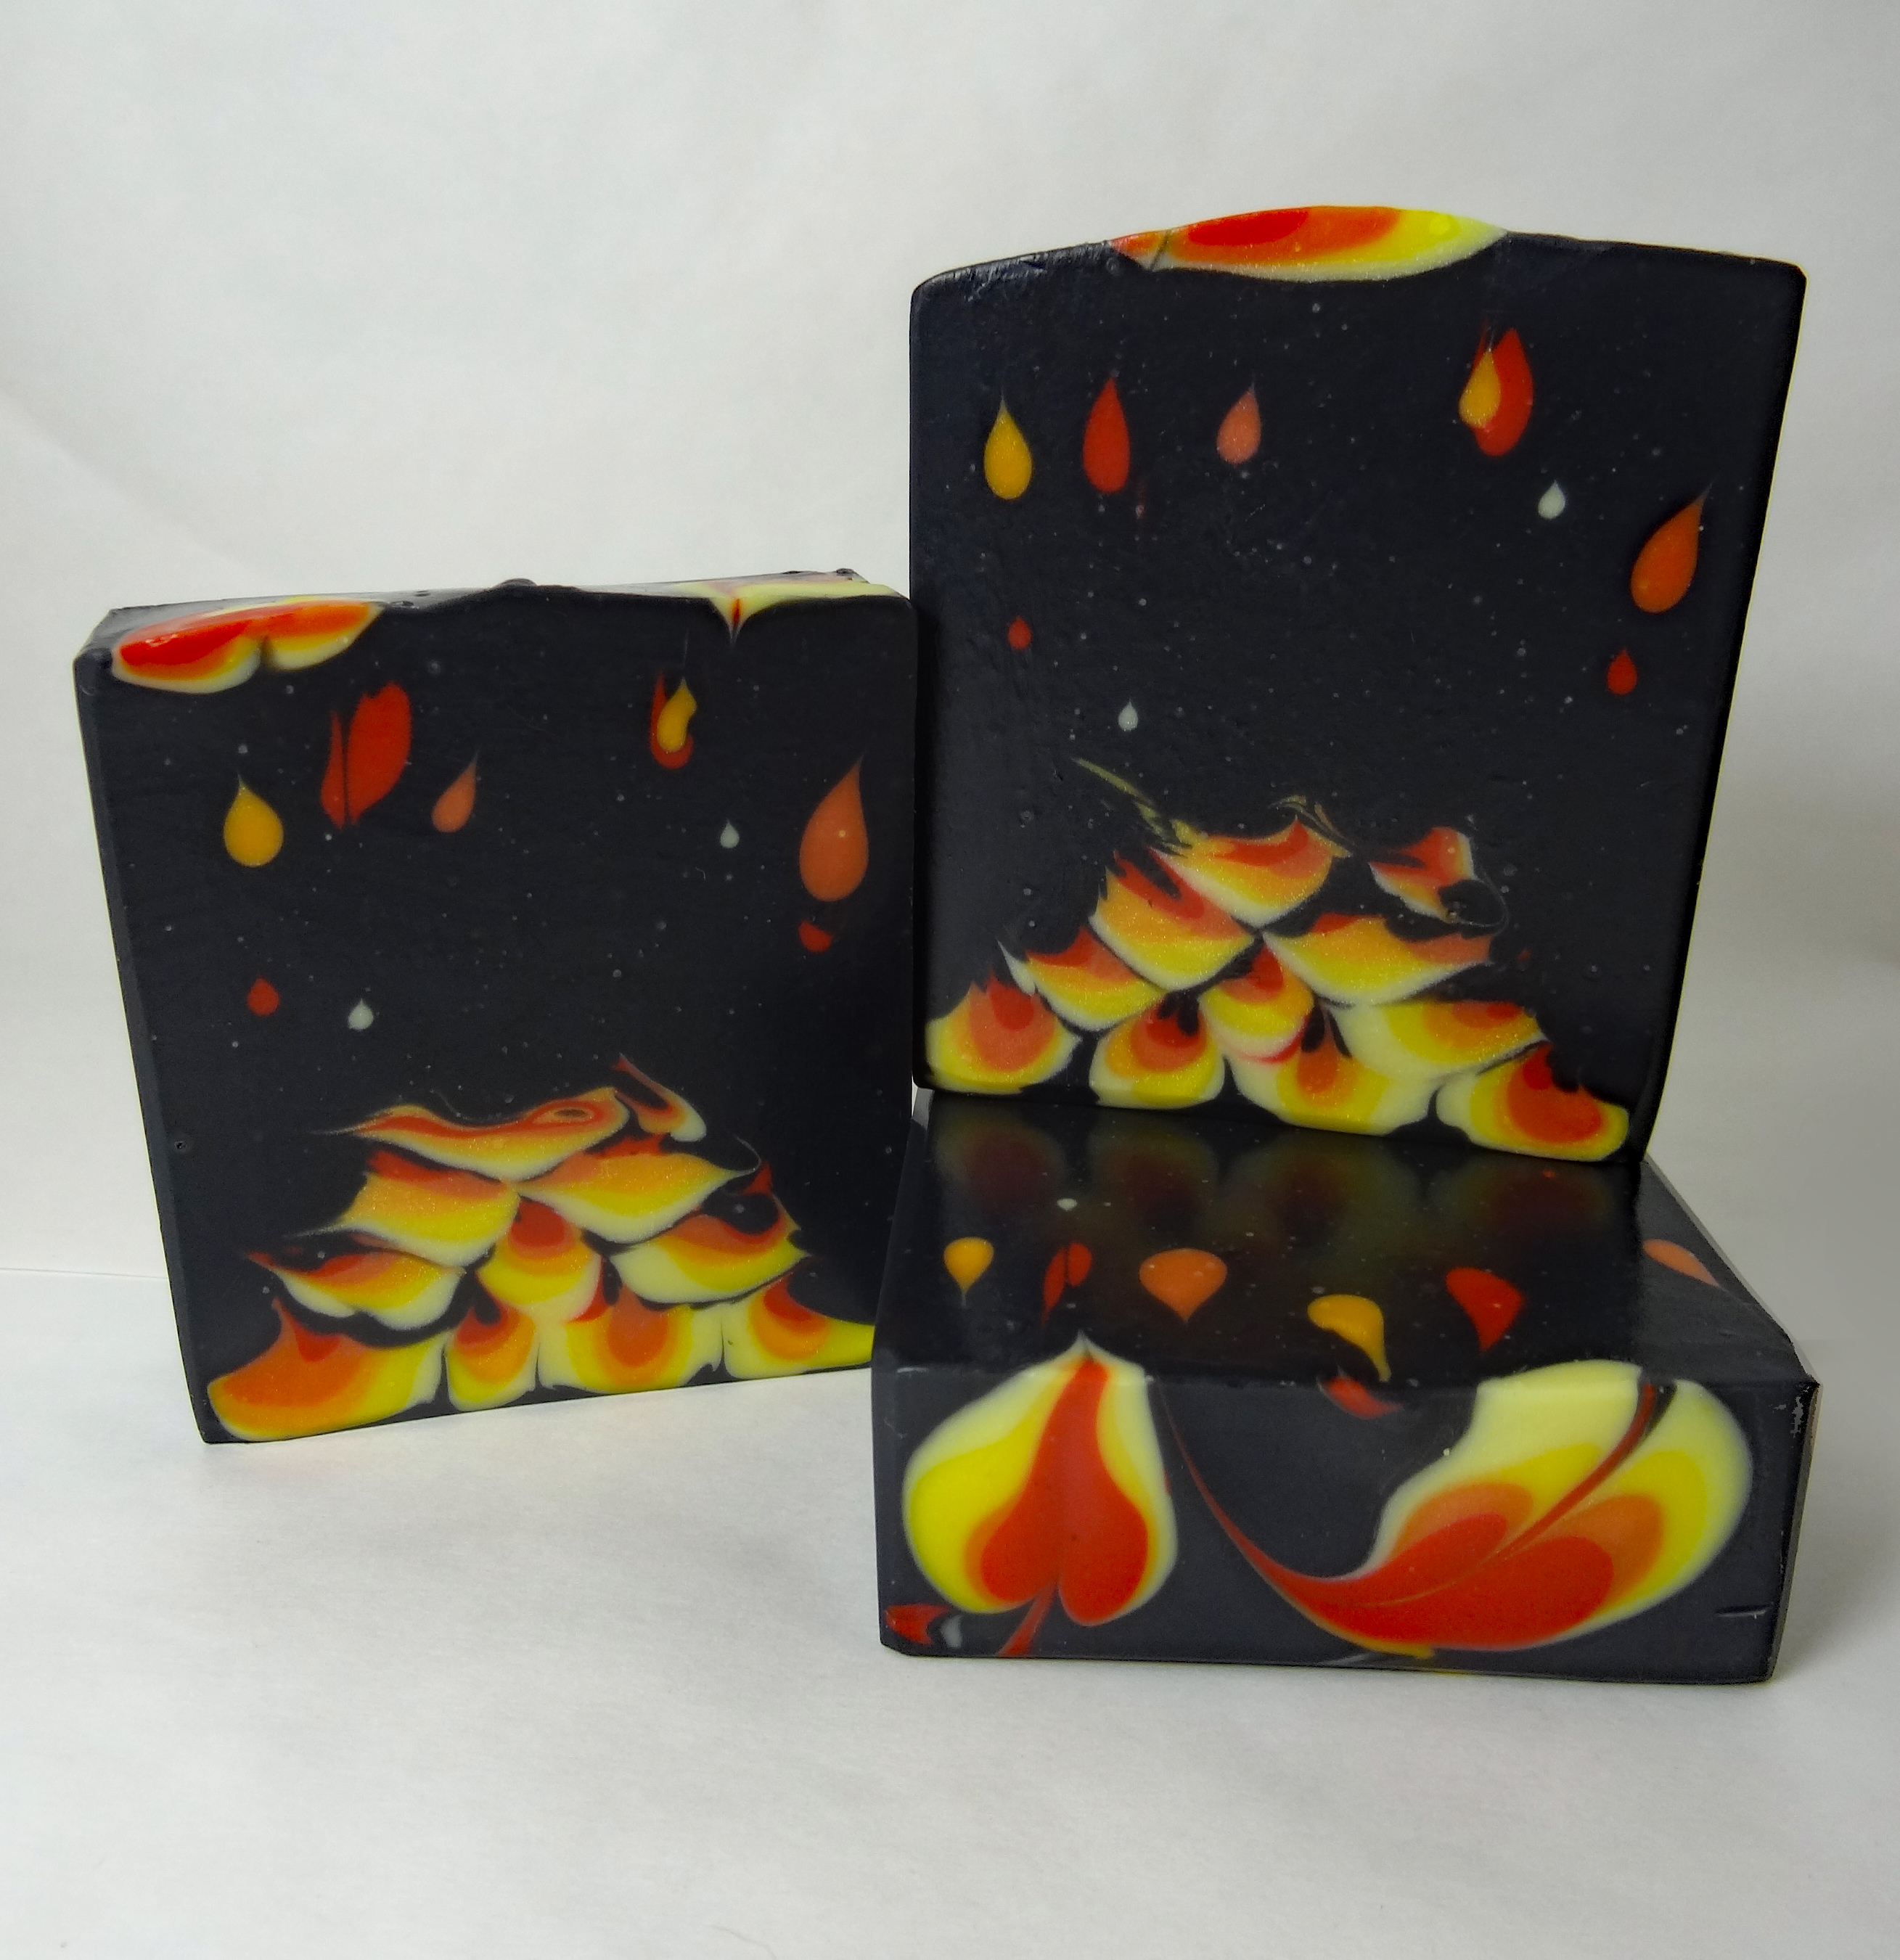 en fuego on fire